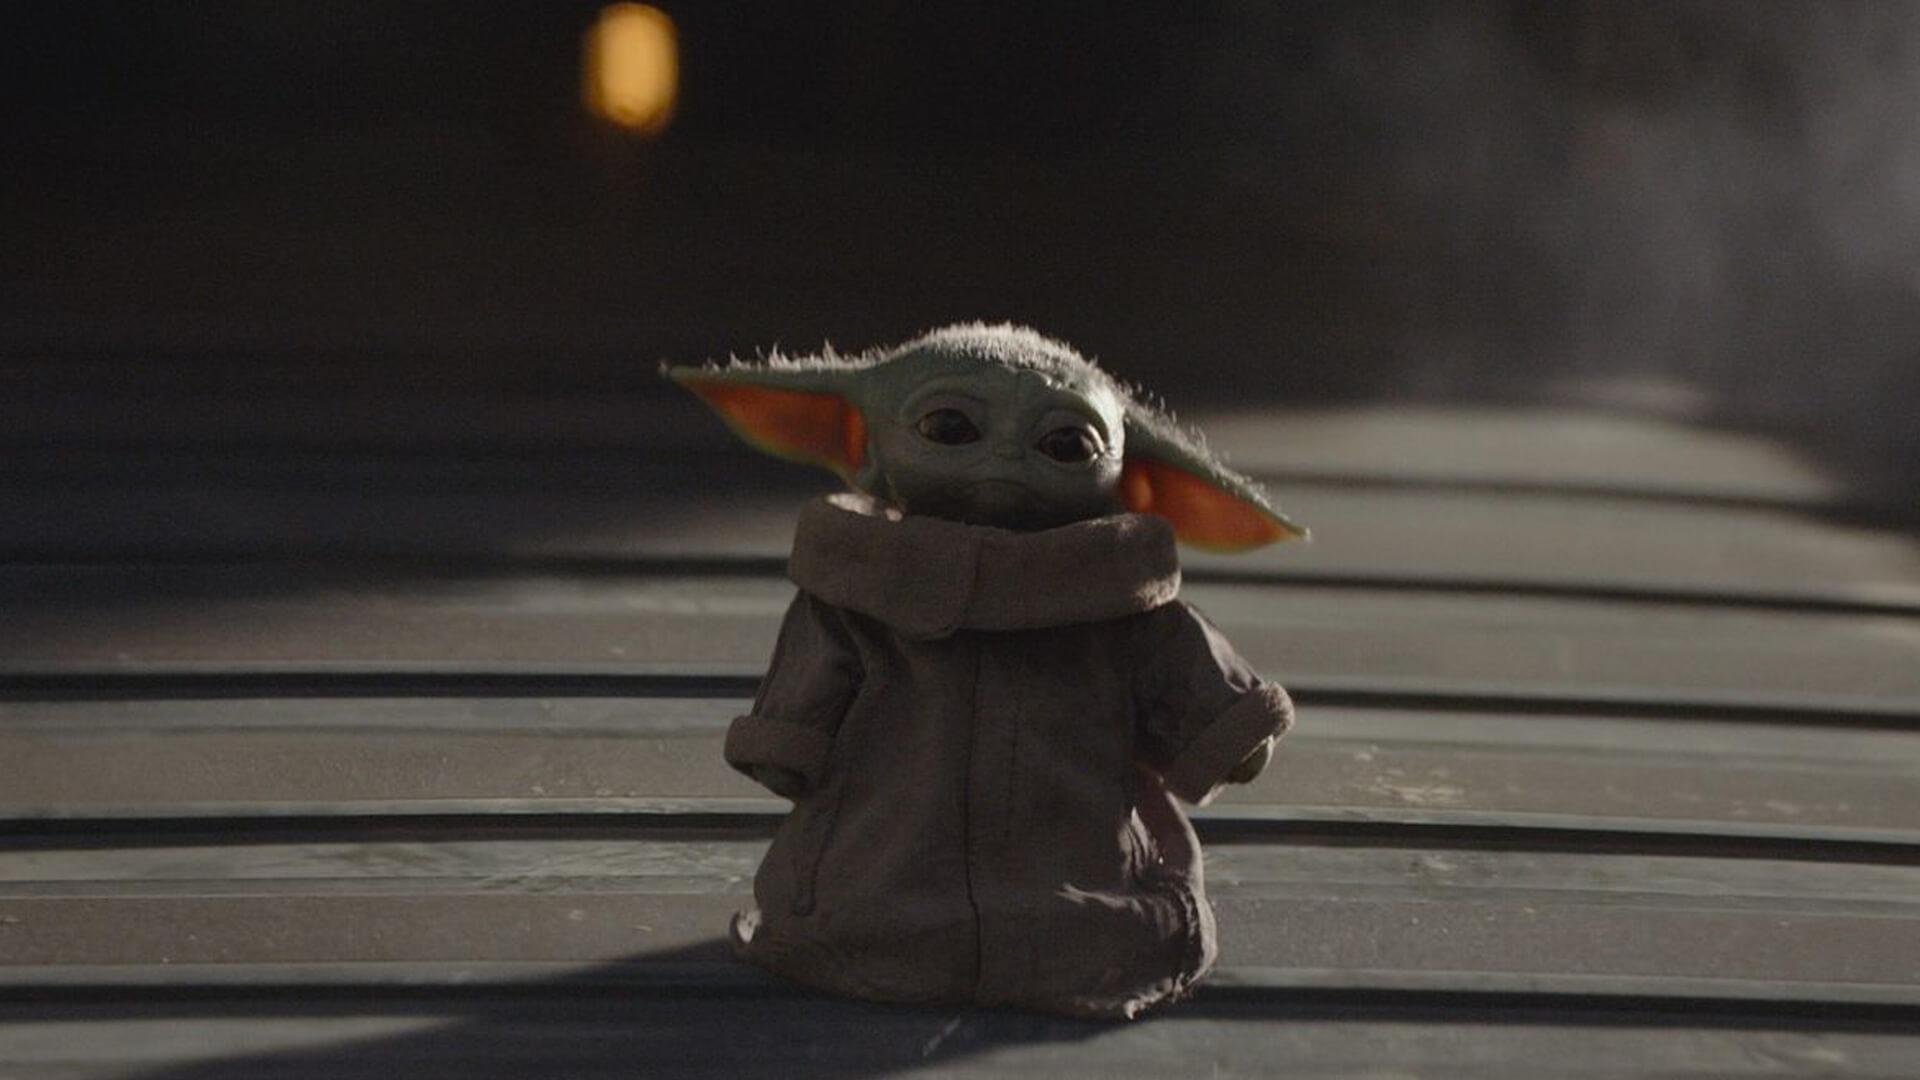 20 Innocent Baby Yoda Wallpapers